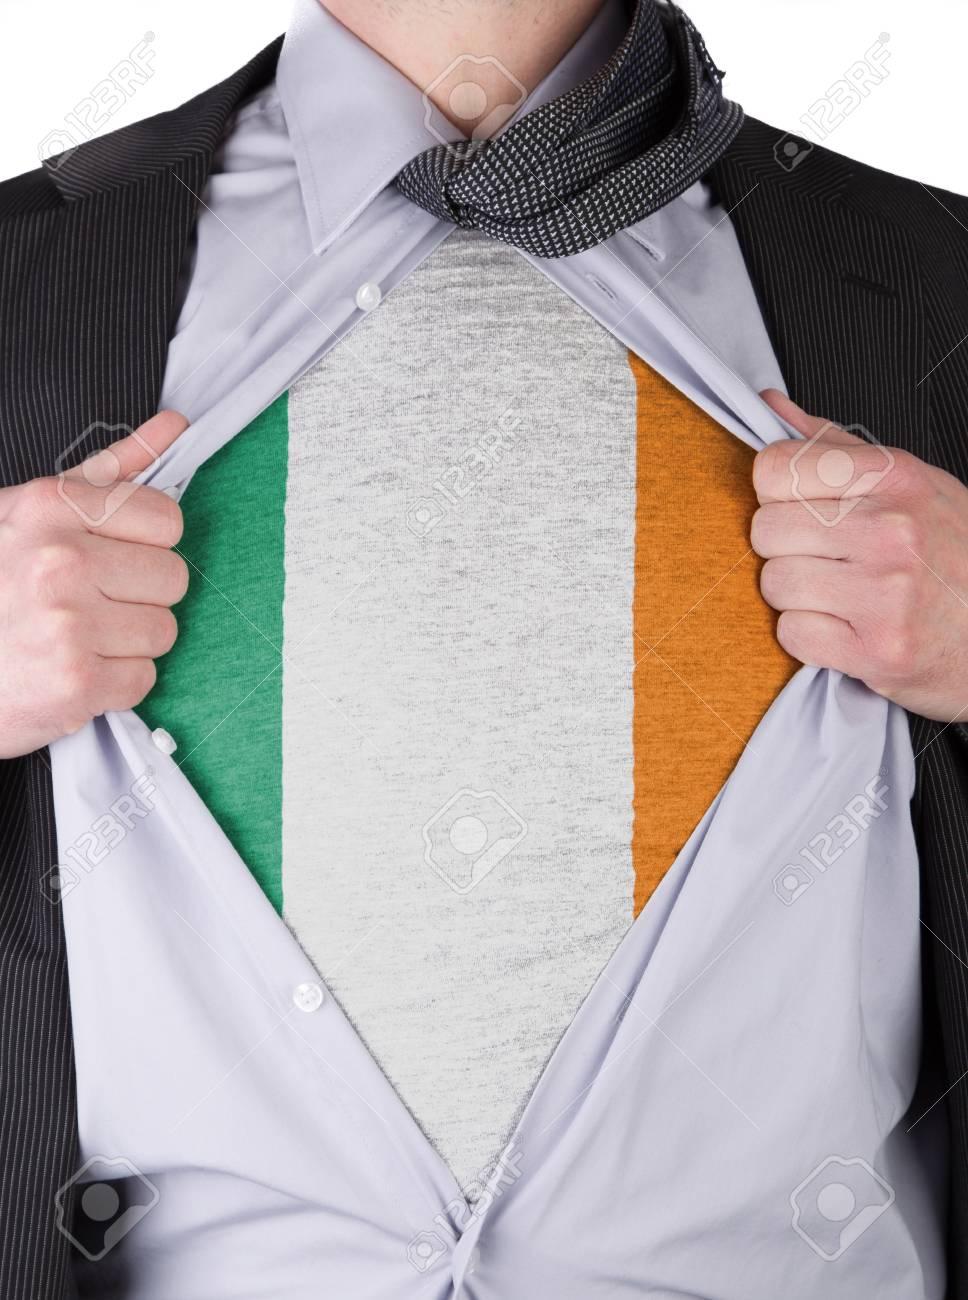 Business man rips open his shirt to show his Irish flag t-shirt Stock Photo - 17541359